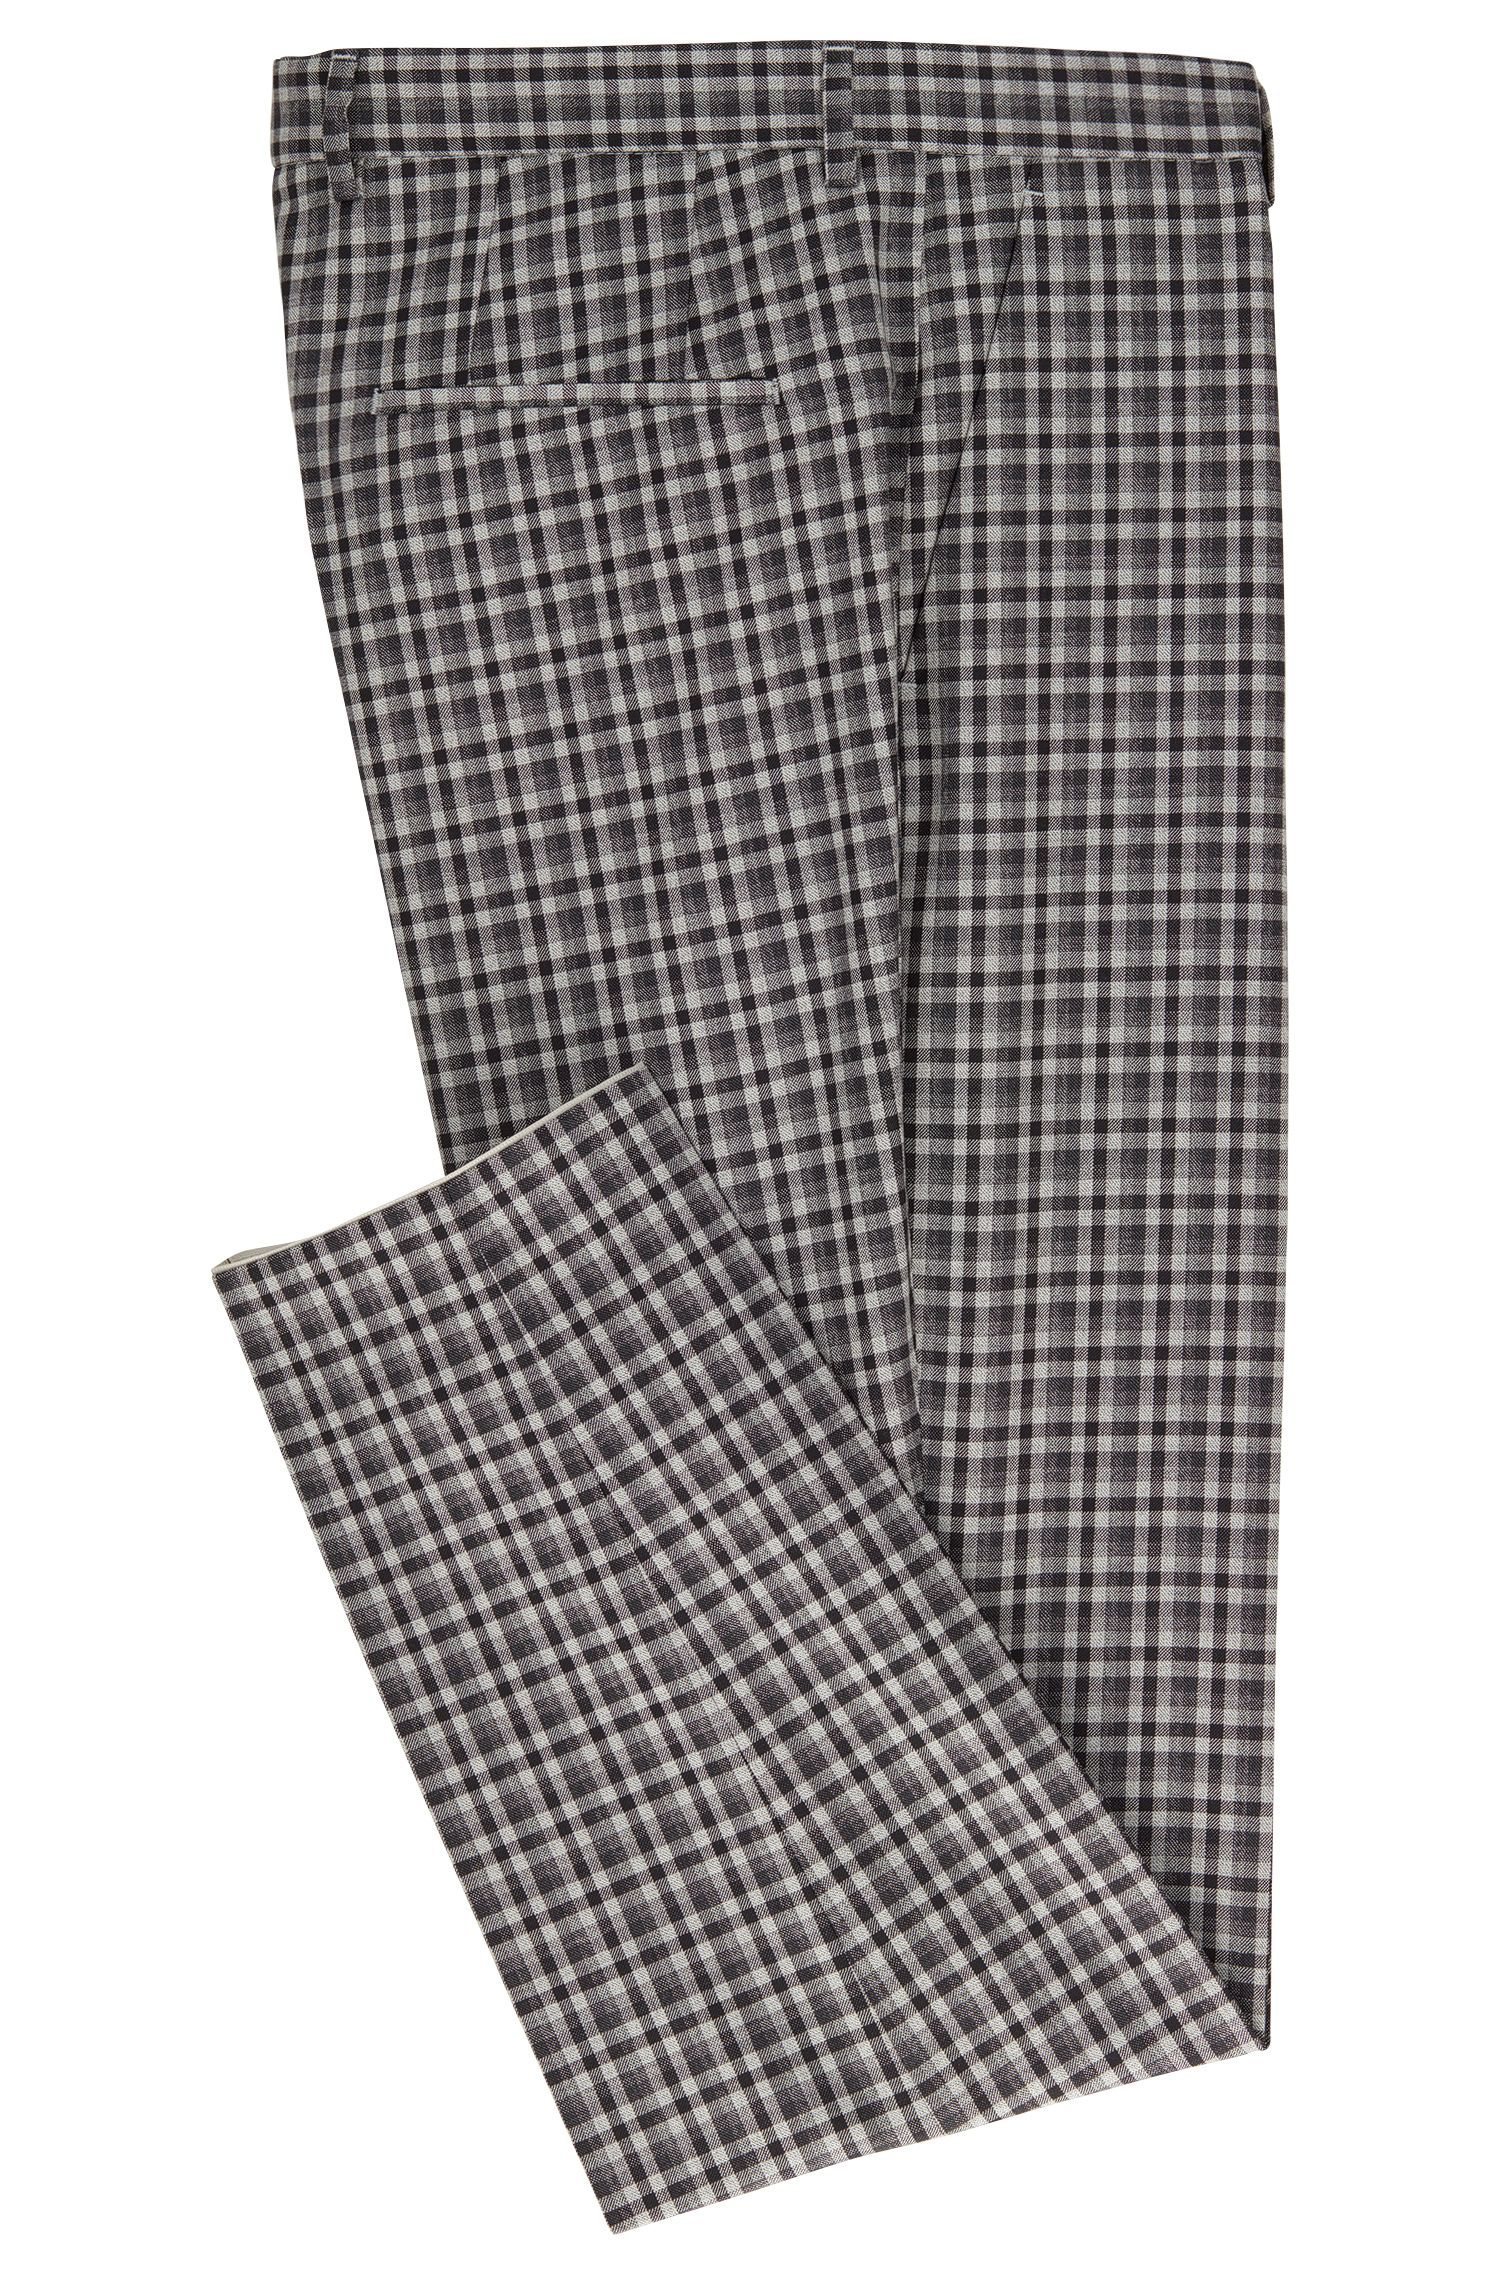 Checked Wool Dress Pant, Slim Fit | Pirko